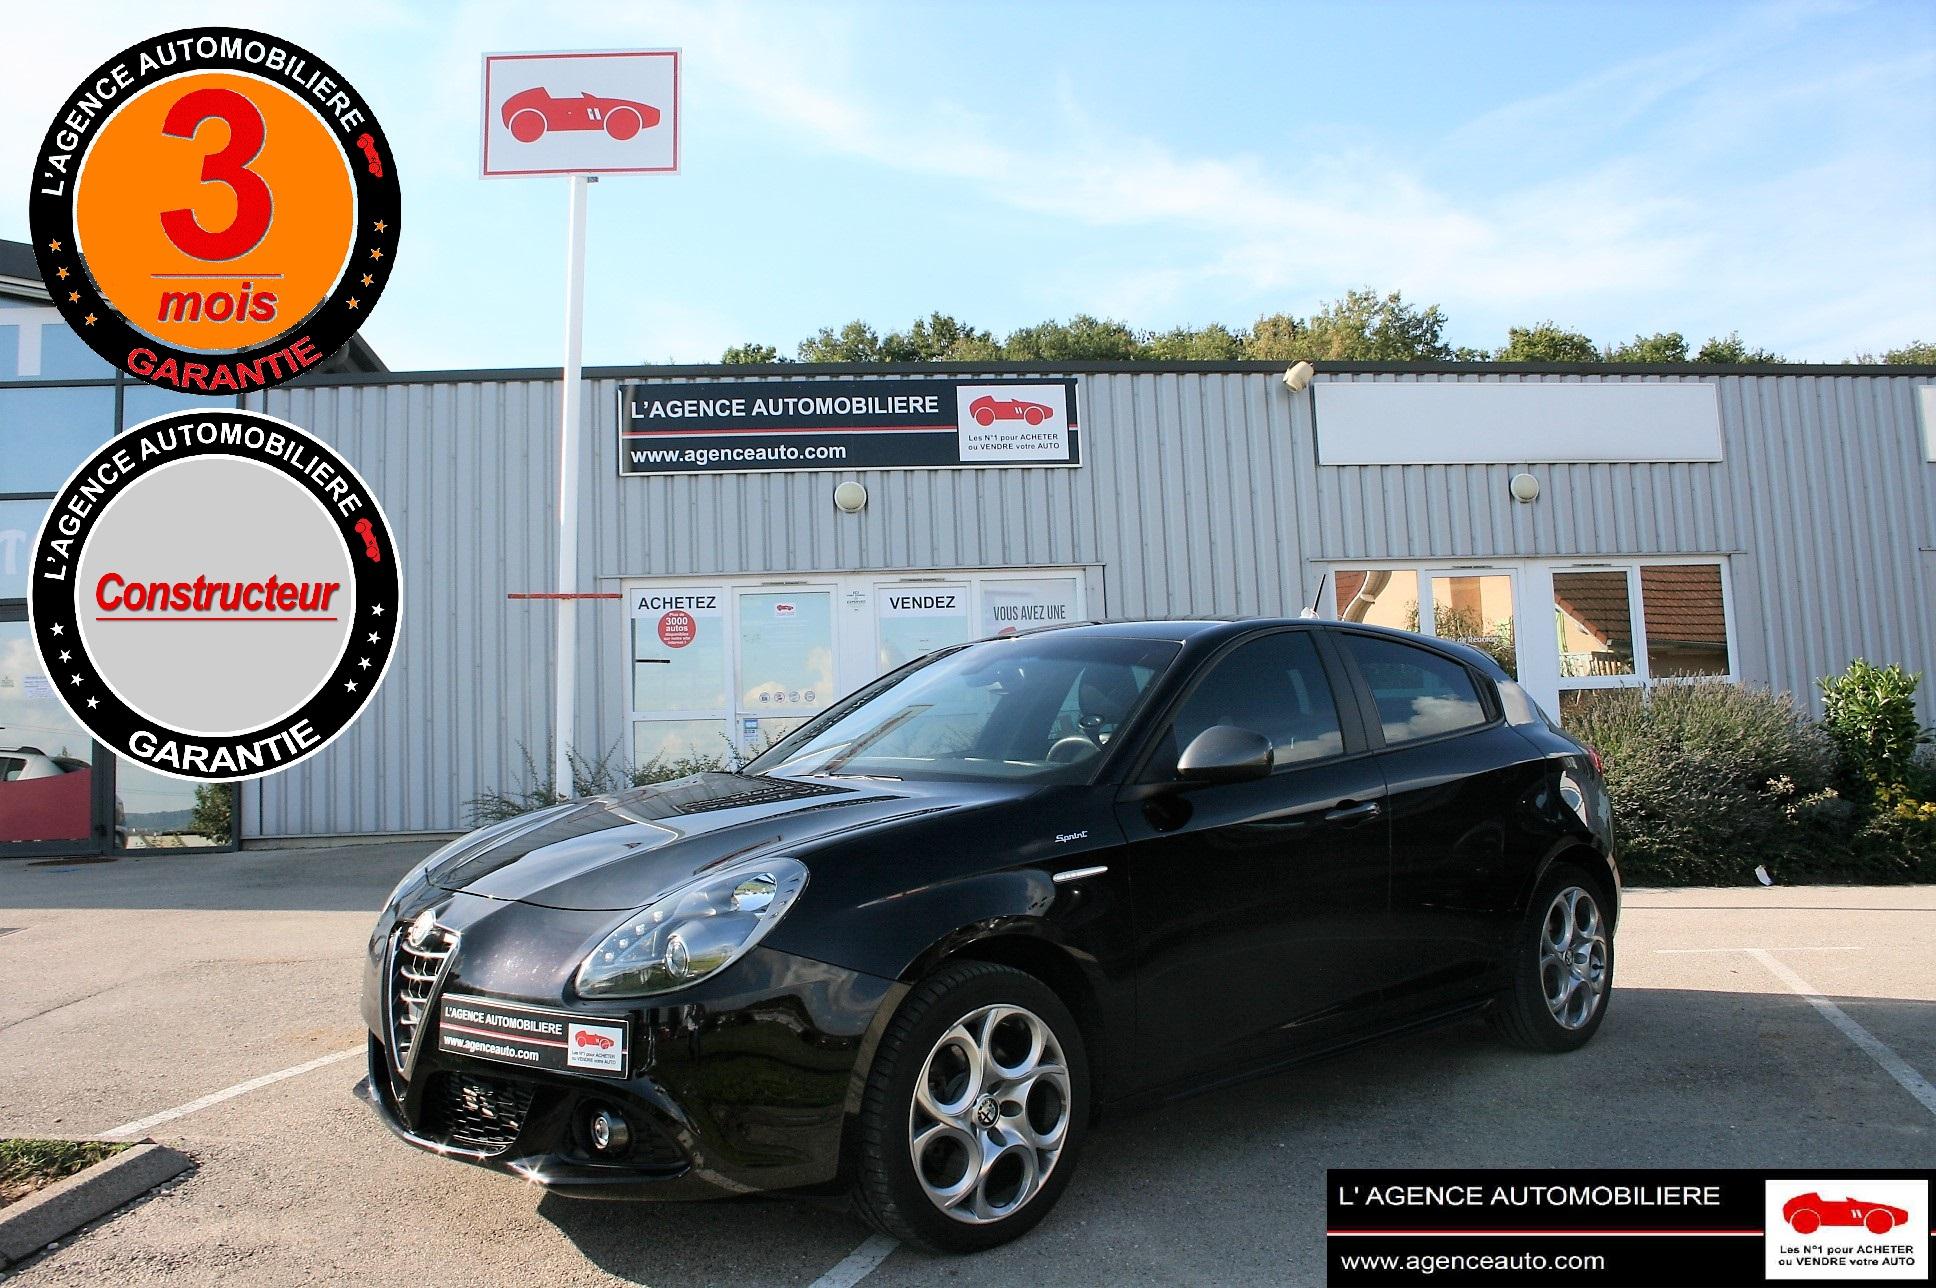 Alfa Romeo Giulietta Iii 3 1 4 Multiair 150 S S Sprint Used Car